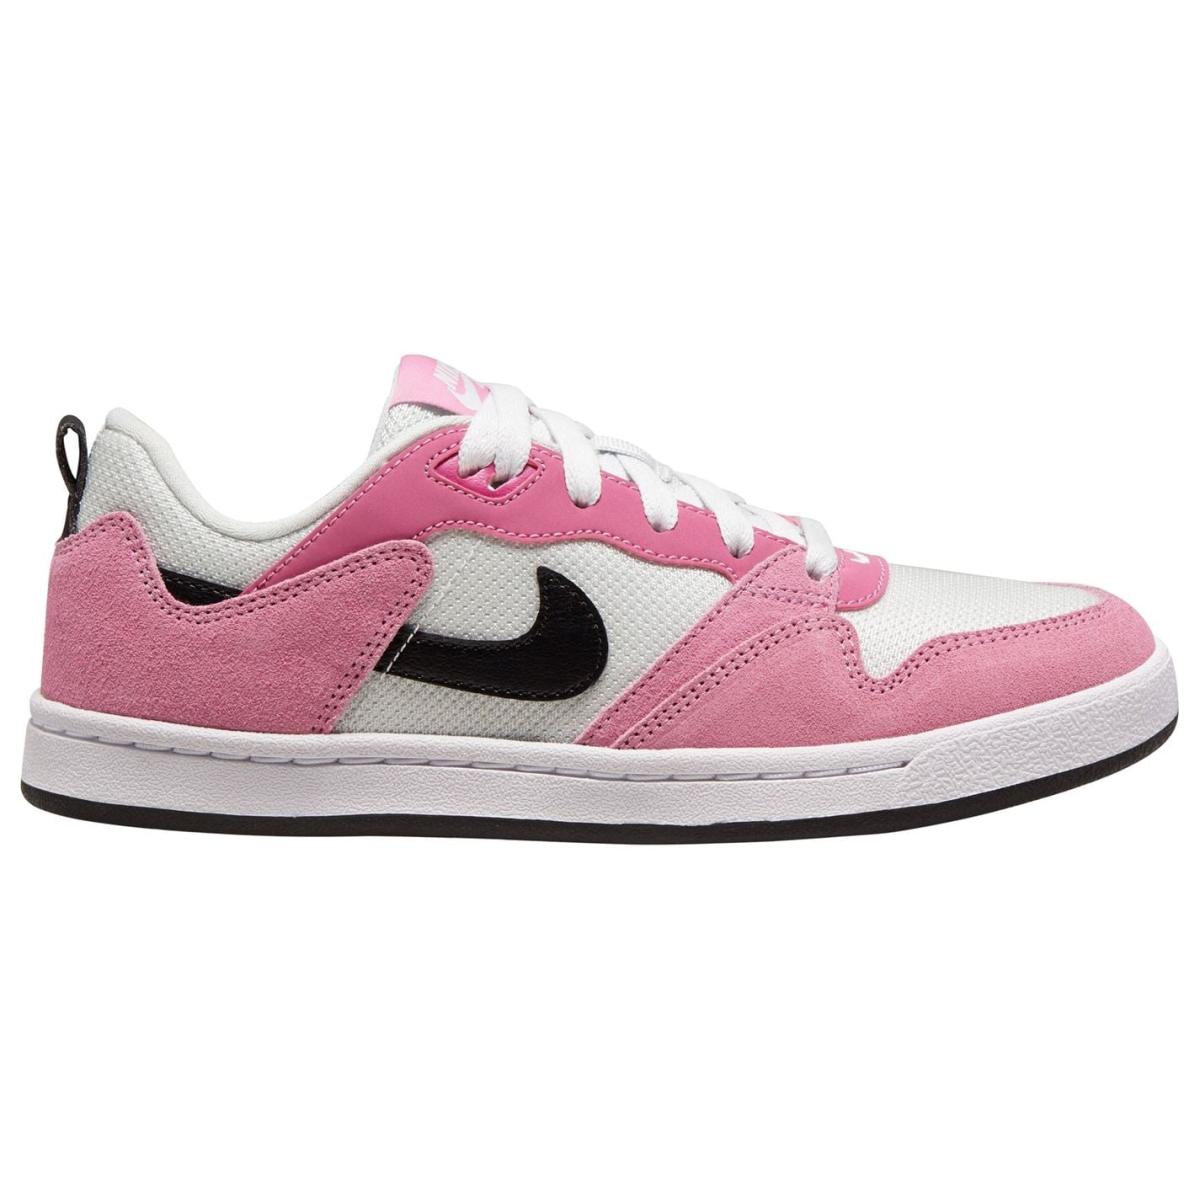 Nike SB Alleyoop Skateschuhe Damen Turnschuhe Skate Sneaker 4008